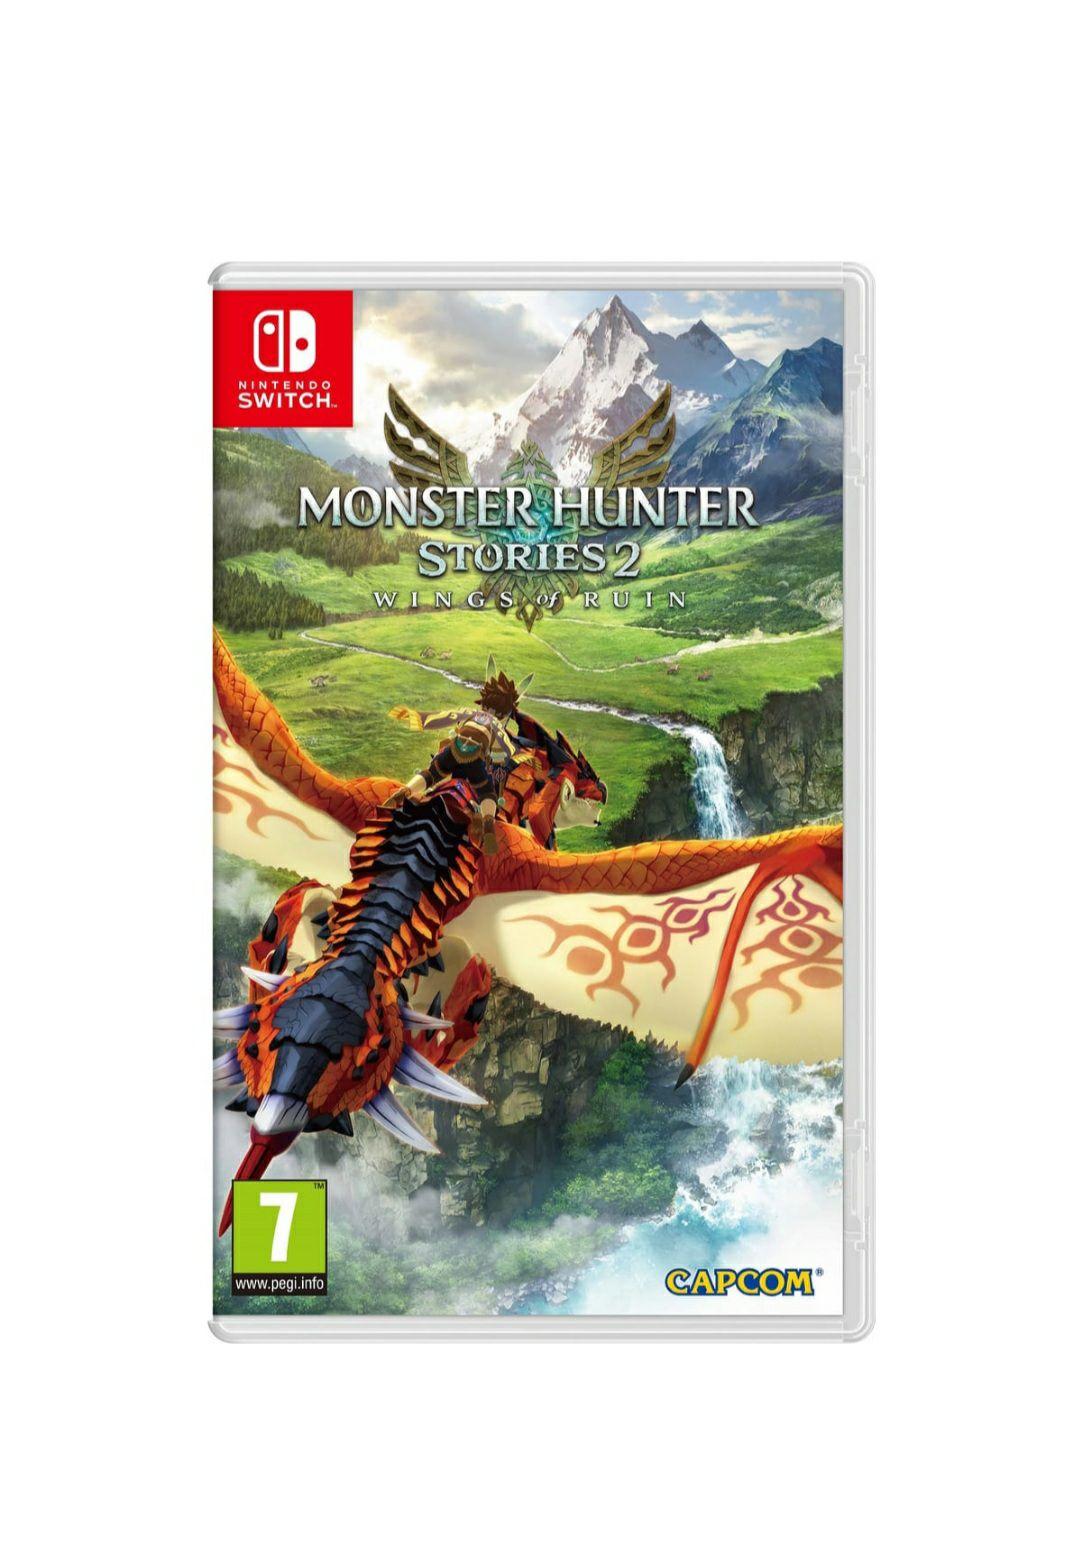 [Précommande] Jeu Monster Hunter Stories 2 : Wings of Ruin sur Nintendo Switch